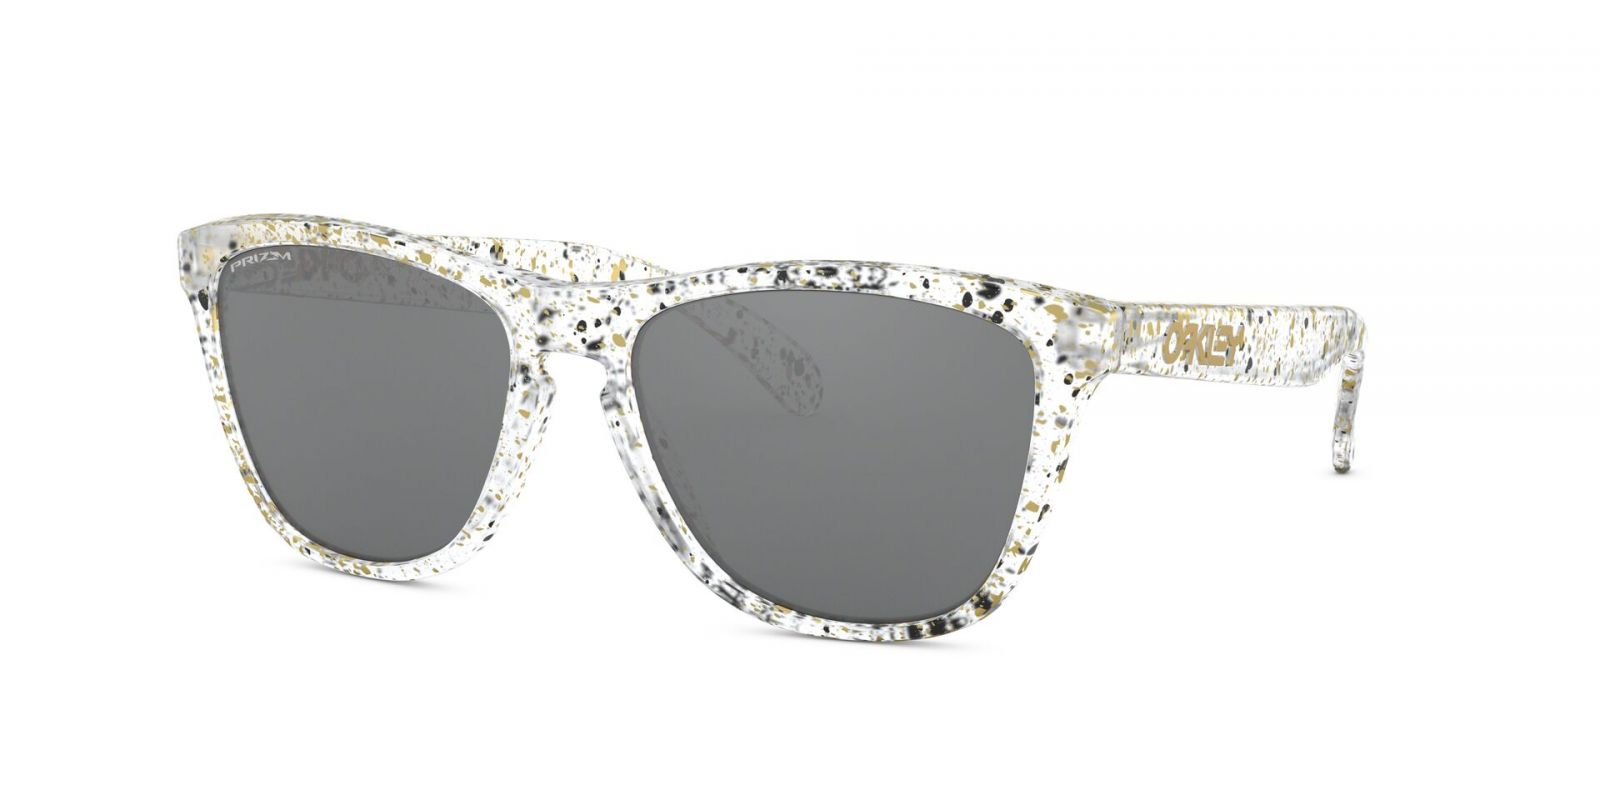 Brýle OAKLEY Frogskins - Splatter Clear w/Prizm Black